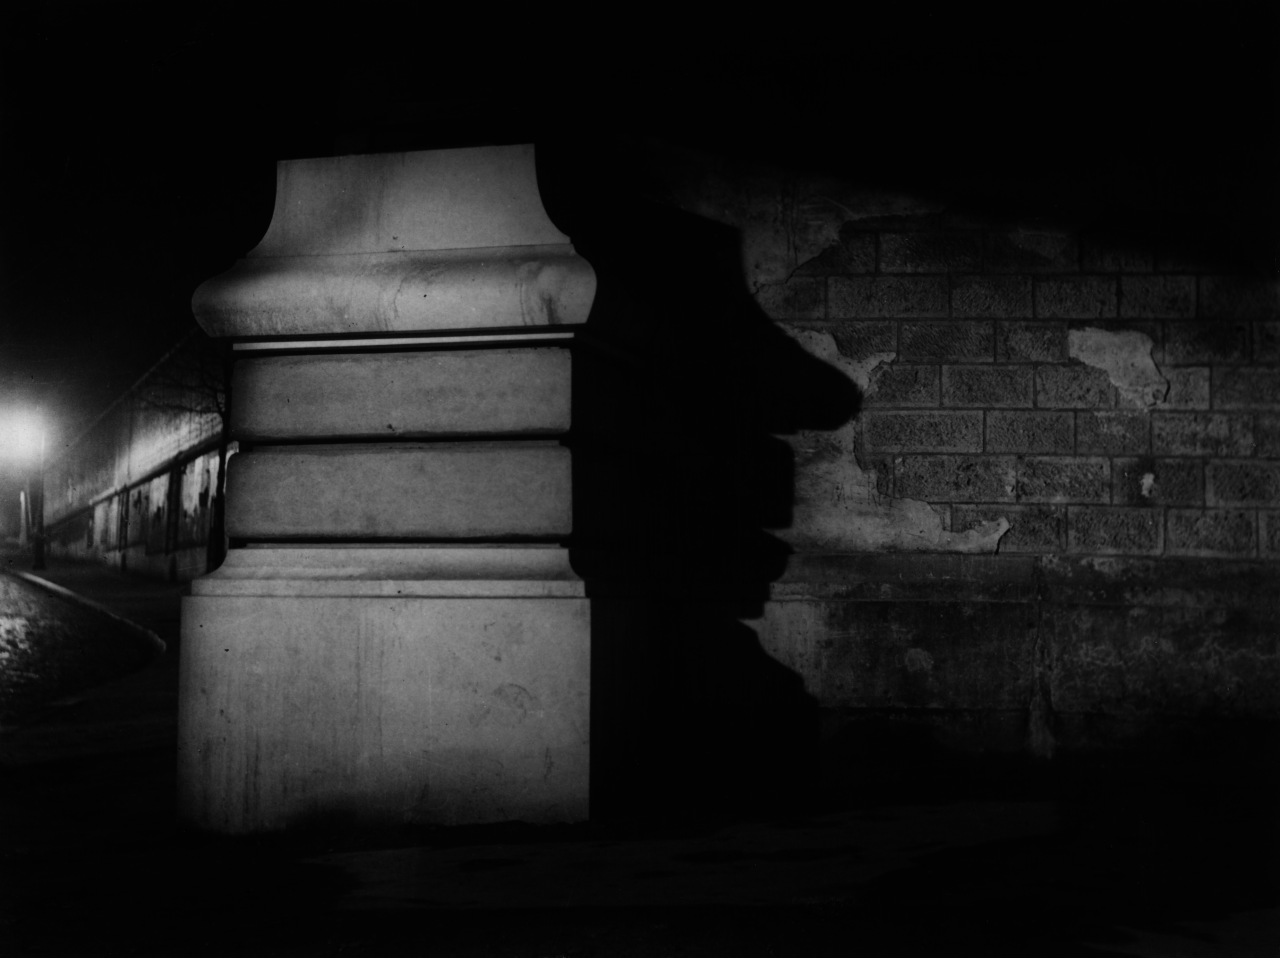 1934. Столб у станции метро Корвизар